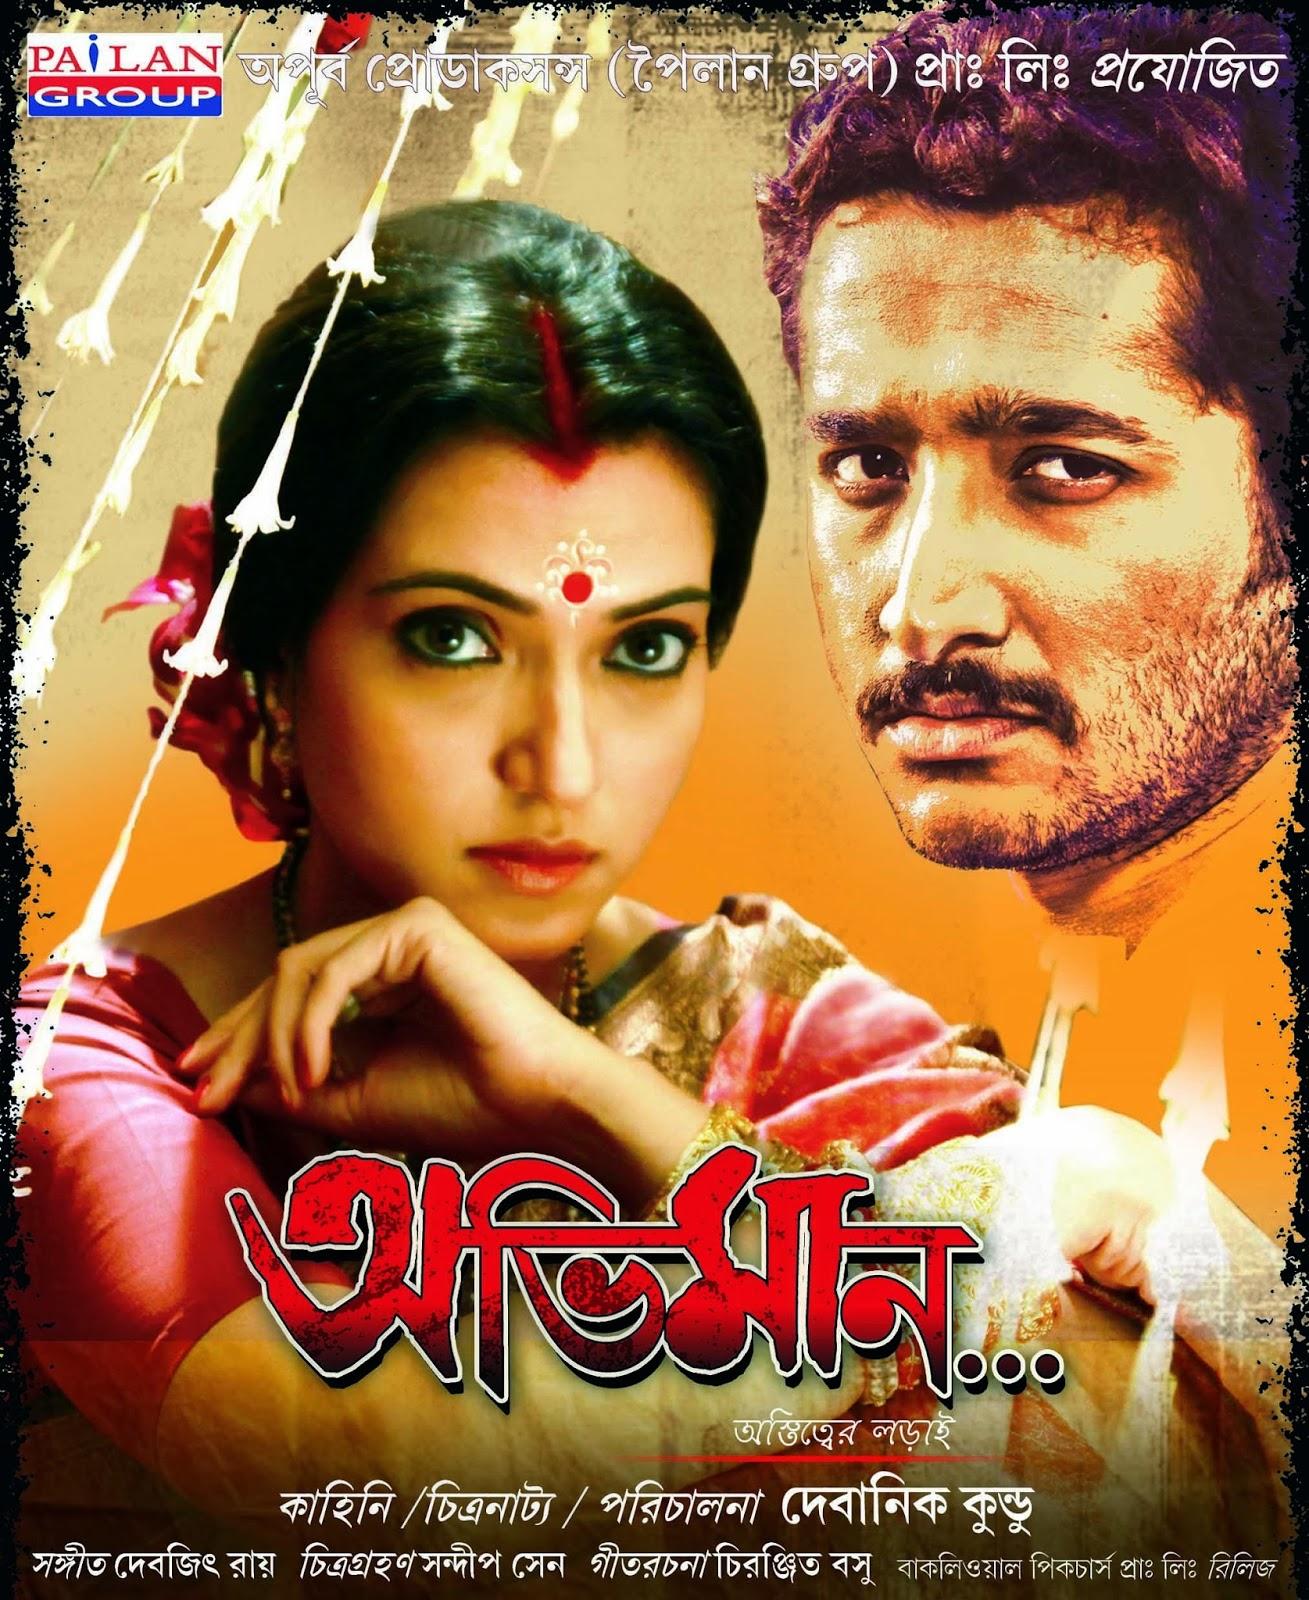 new kolkata moviee 2014 click hear.................... Abhiman+2012+bengali+movie+%25283%2529